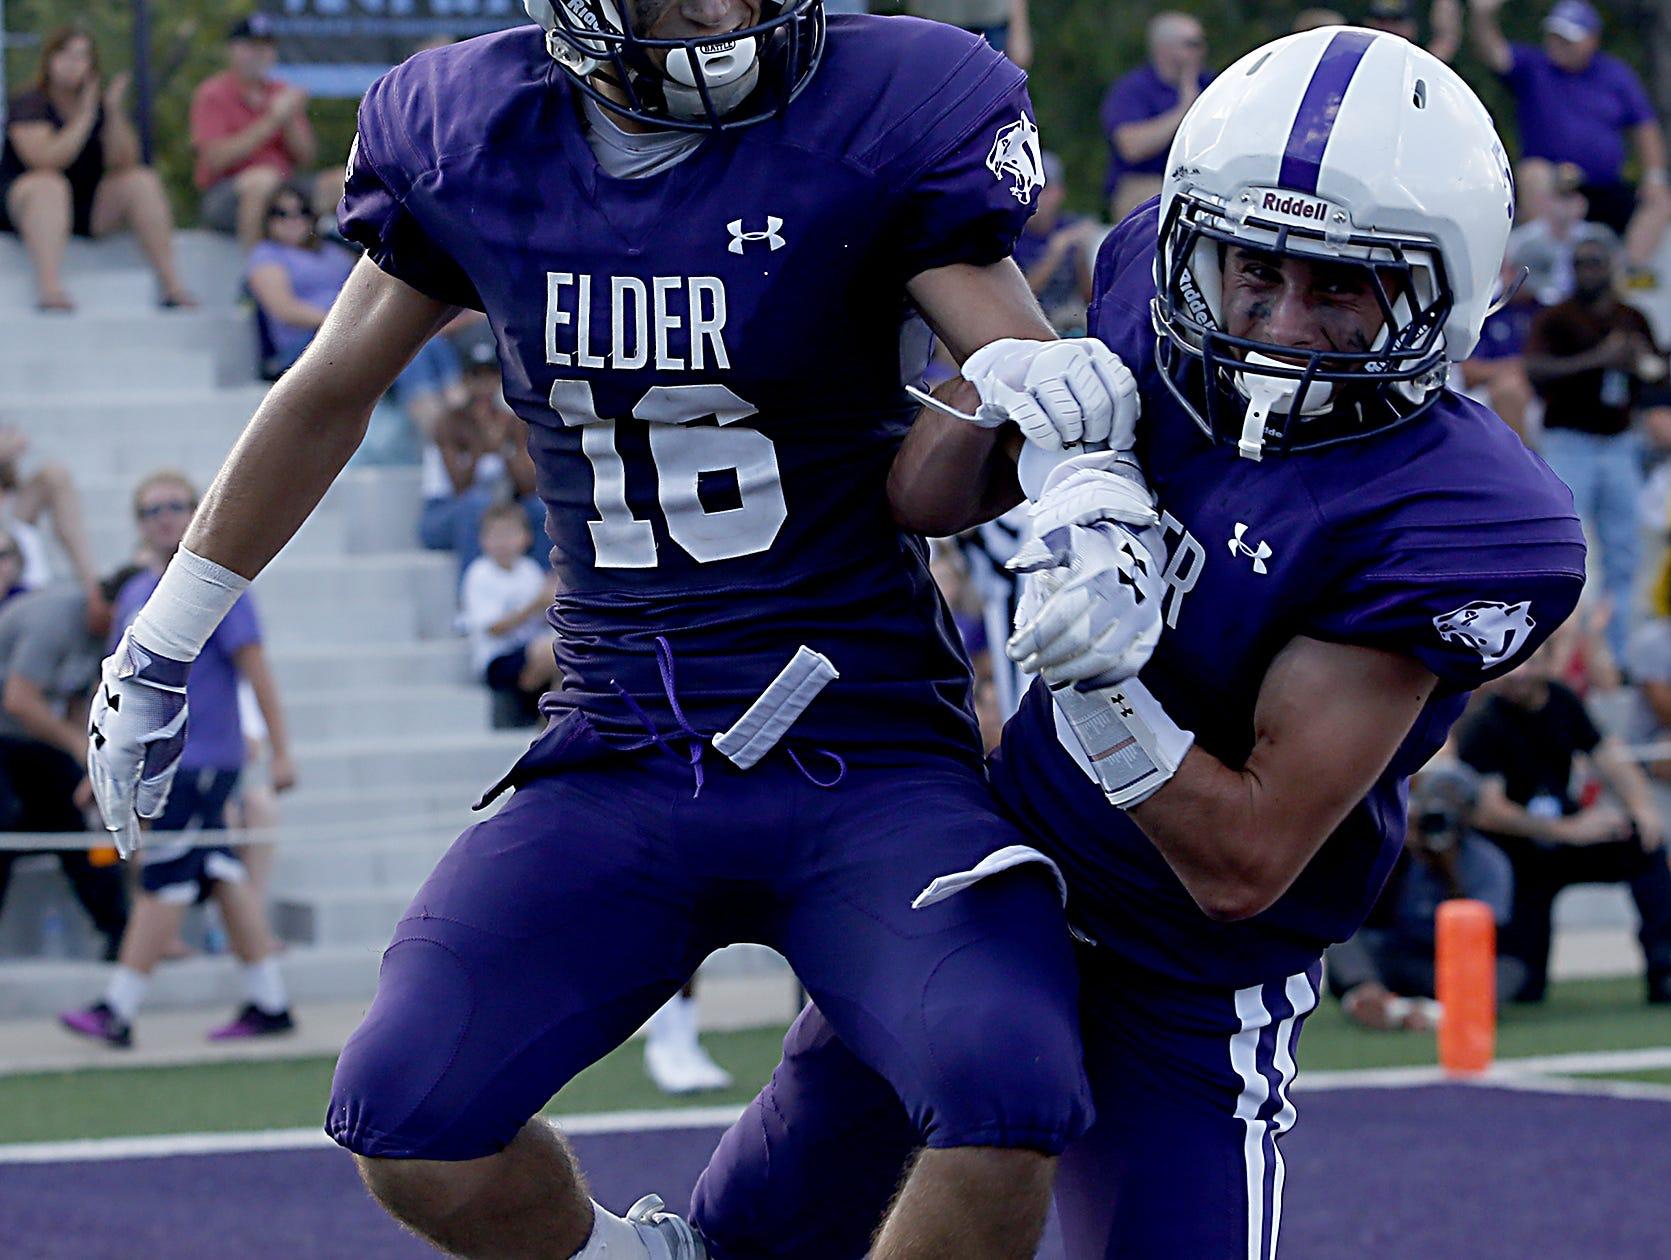 Elder's Kyle Trischler and Sean O'Conner celebrate Trischler's touchdown against St. Edward during their game at The Pit in Cincinnati Saturday, Sept. 15, 2018.